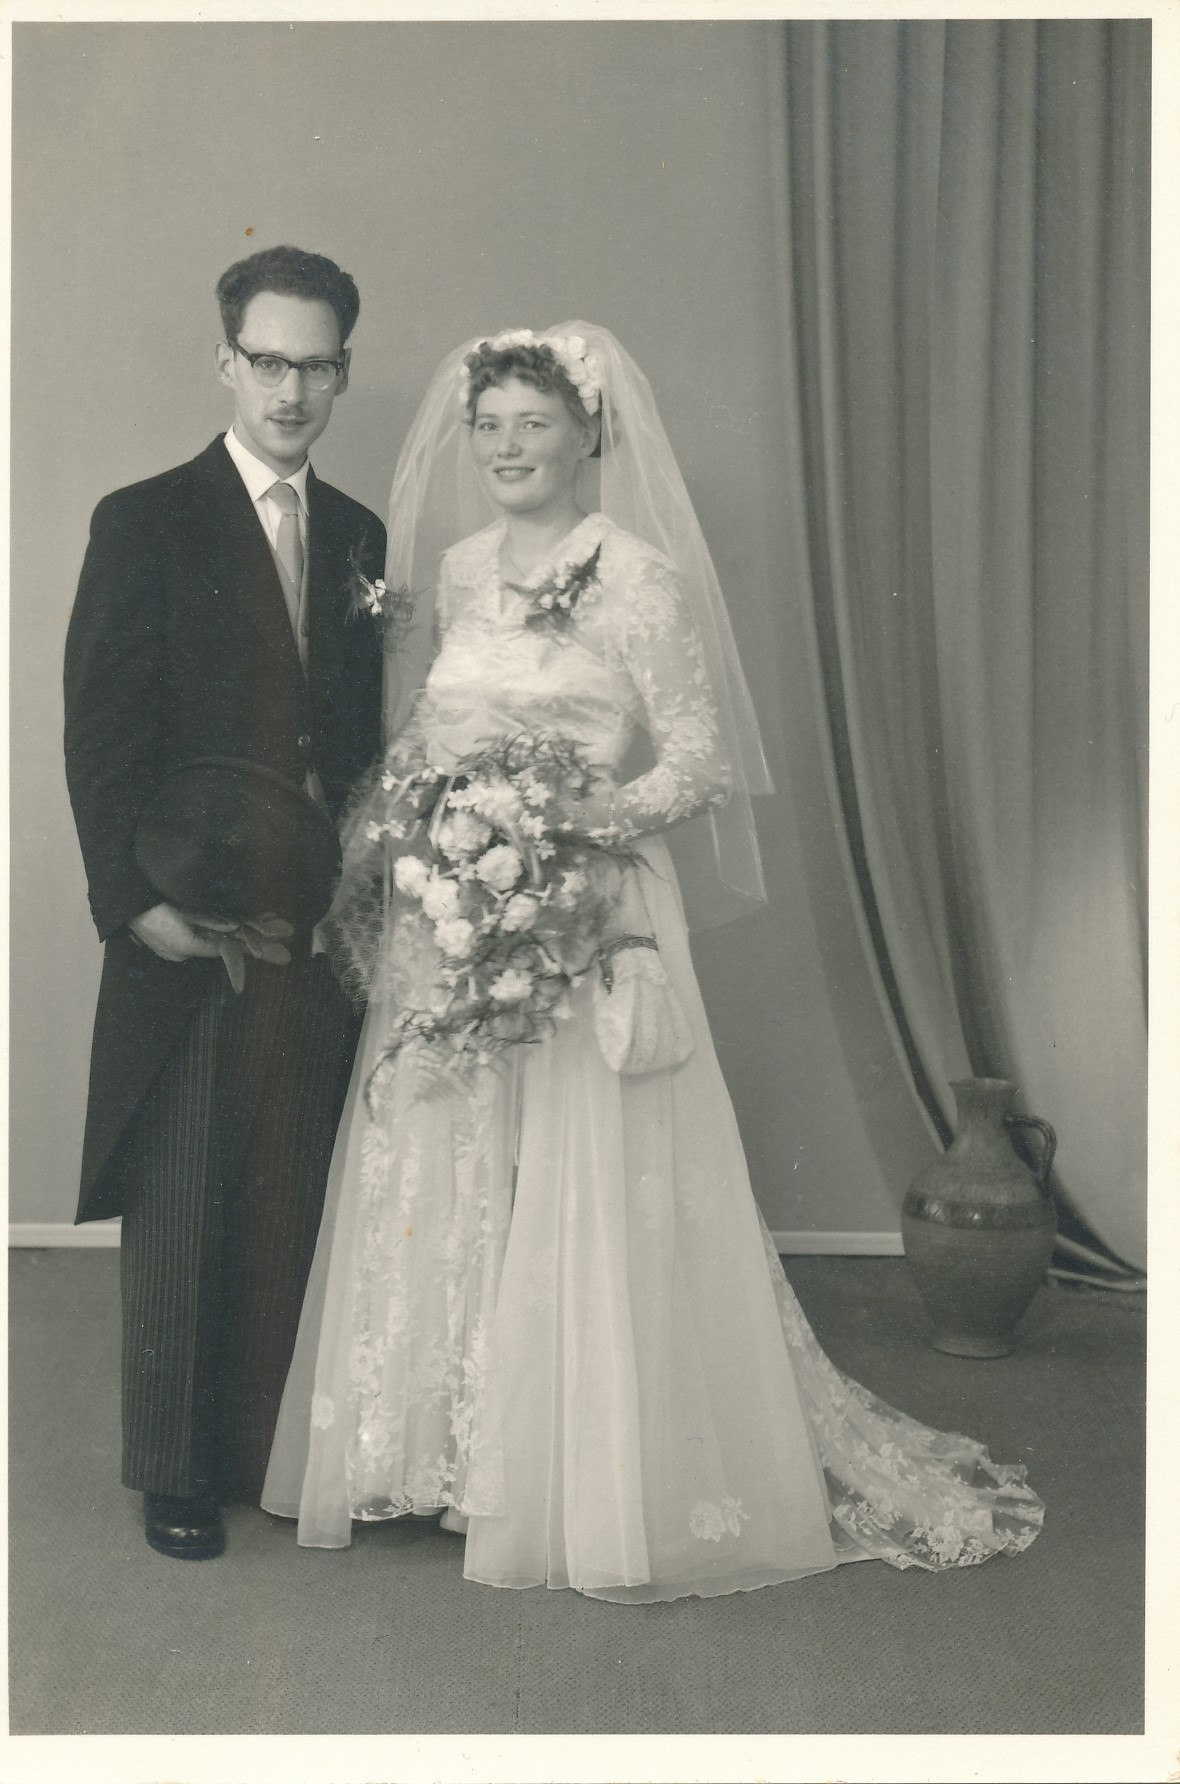 Fotoalbum Andre Kamsma, 135, Houlik Andre Kamsma en Hilly Visser, 27-07-1957